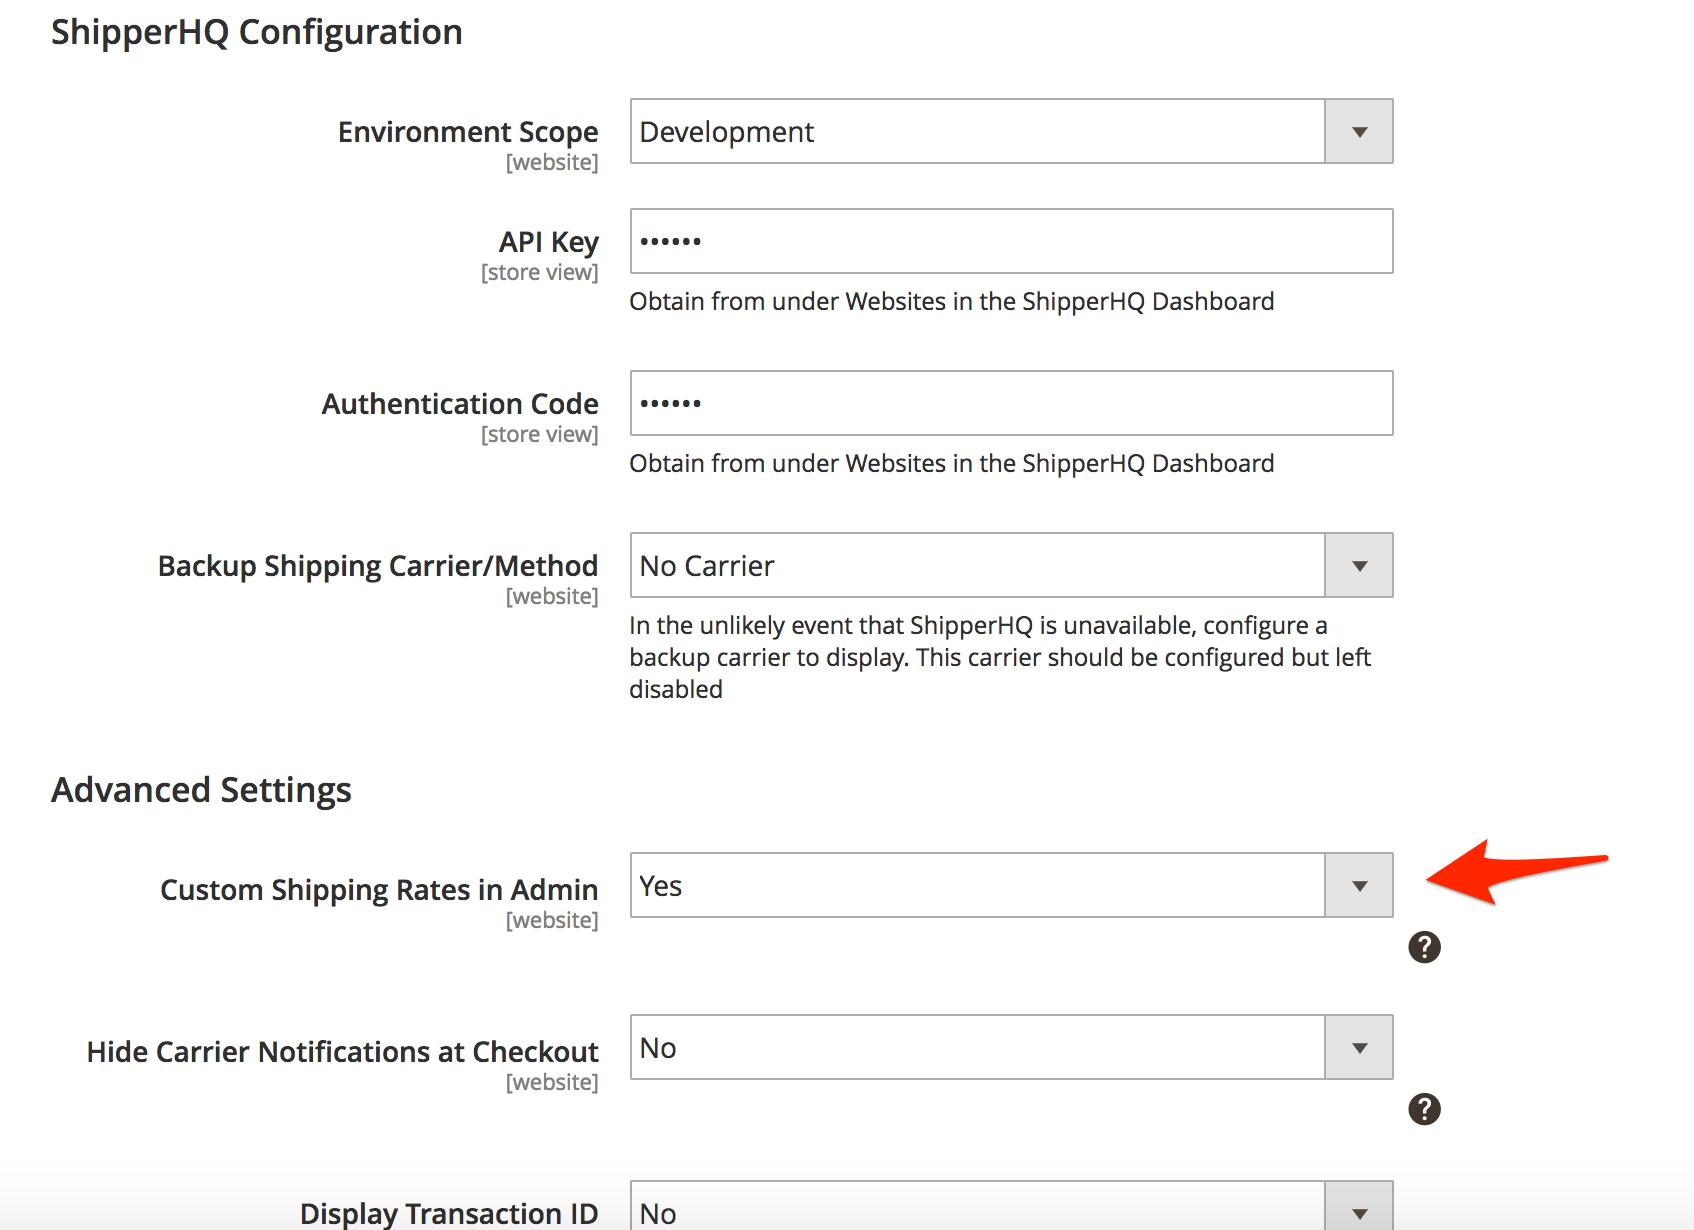 How to Set Up an Admin Shipping Carrier - ShipperHQ Docs